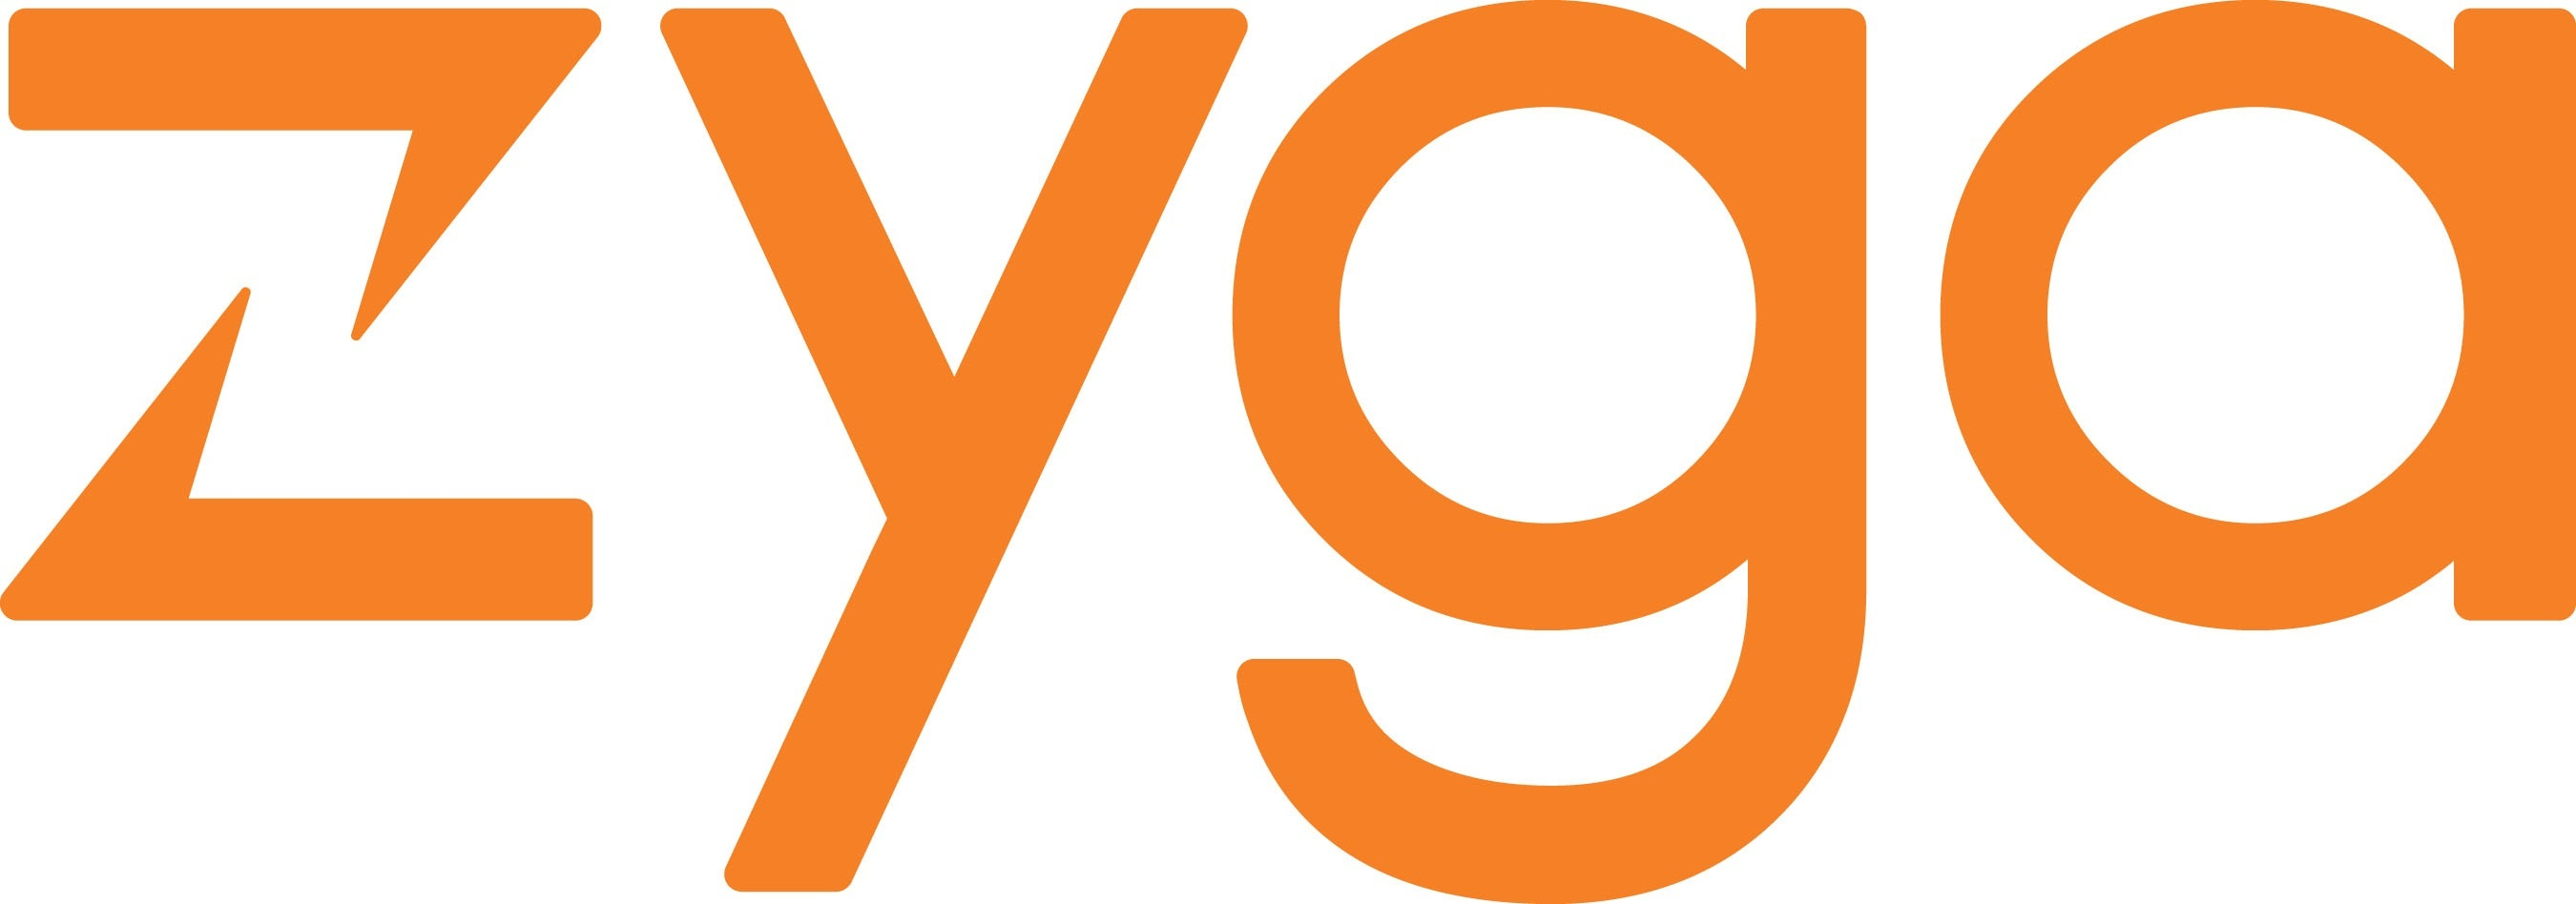 Zyga - Logo